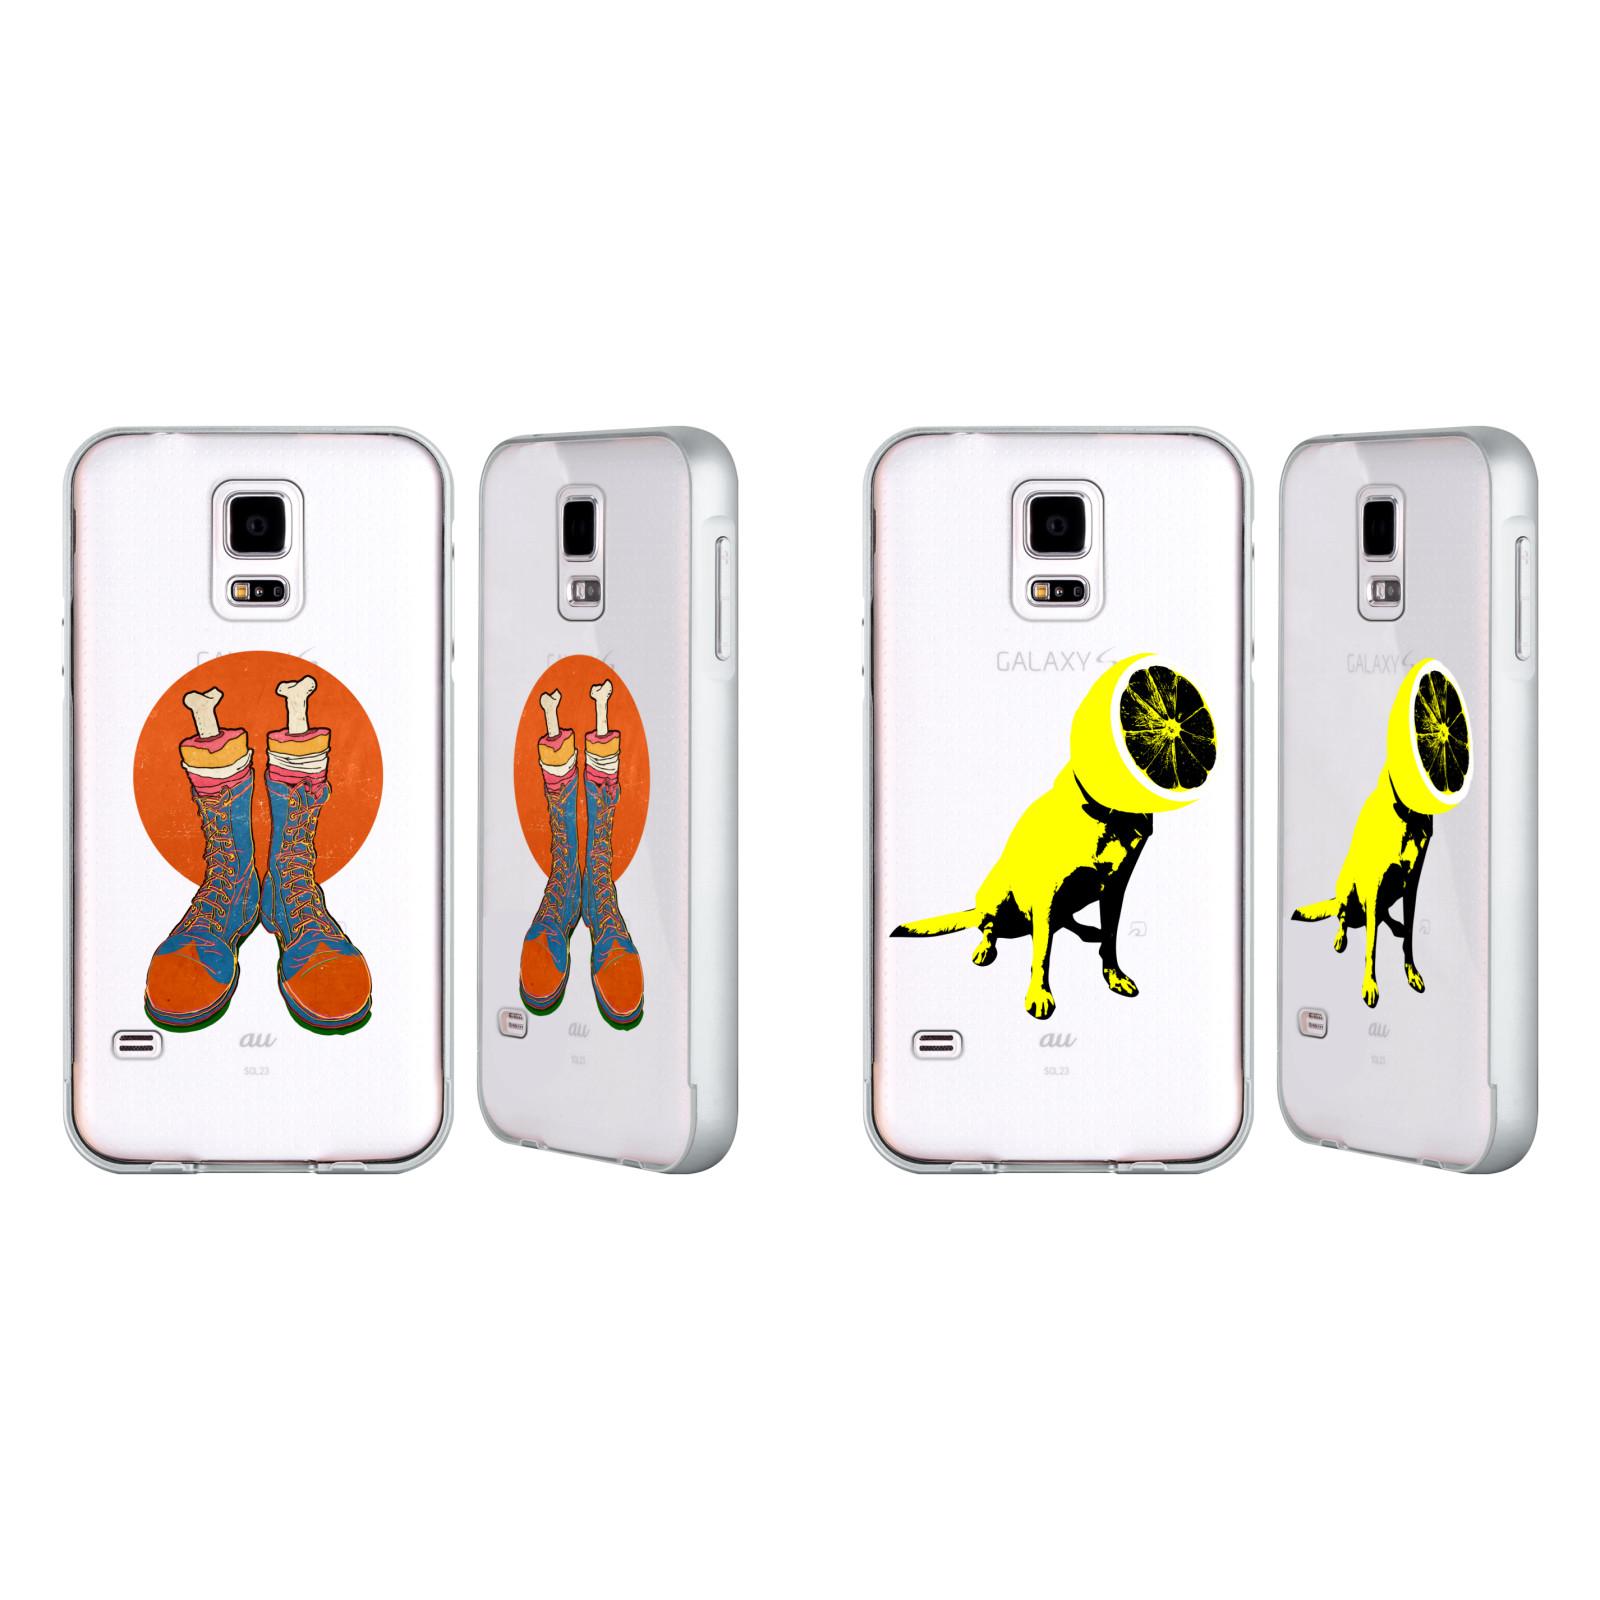 OFFICIAL-ALI-GULEC-THE-FUN-2-SILVER-BUMPER-SLIDER-CASE-FOR-SAMSUNG-PHONES